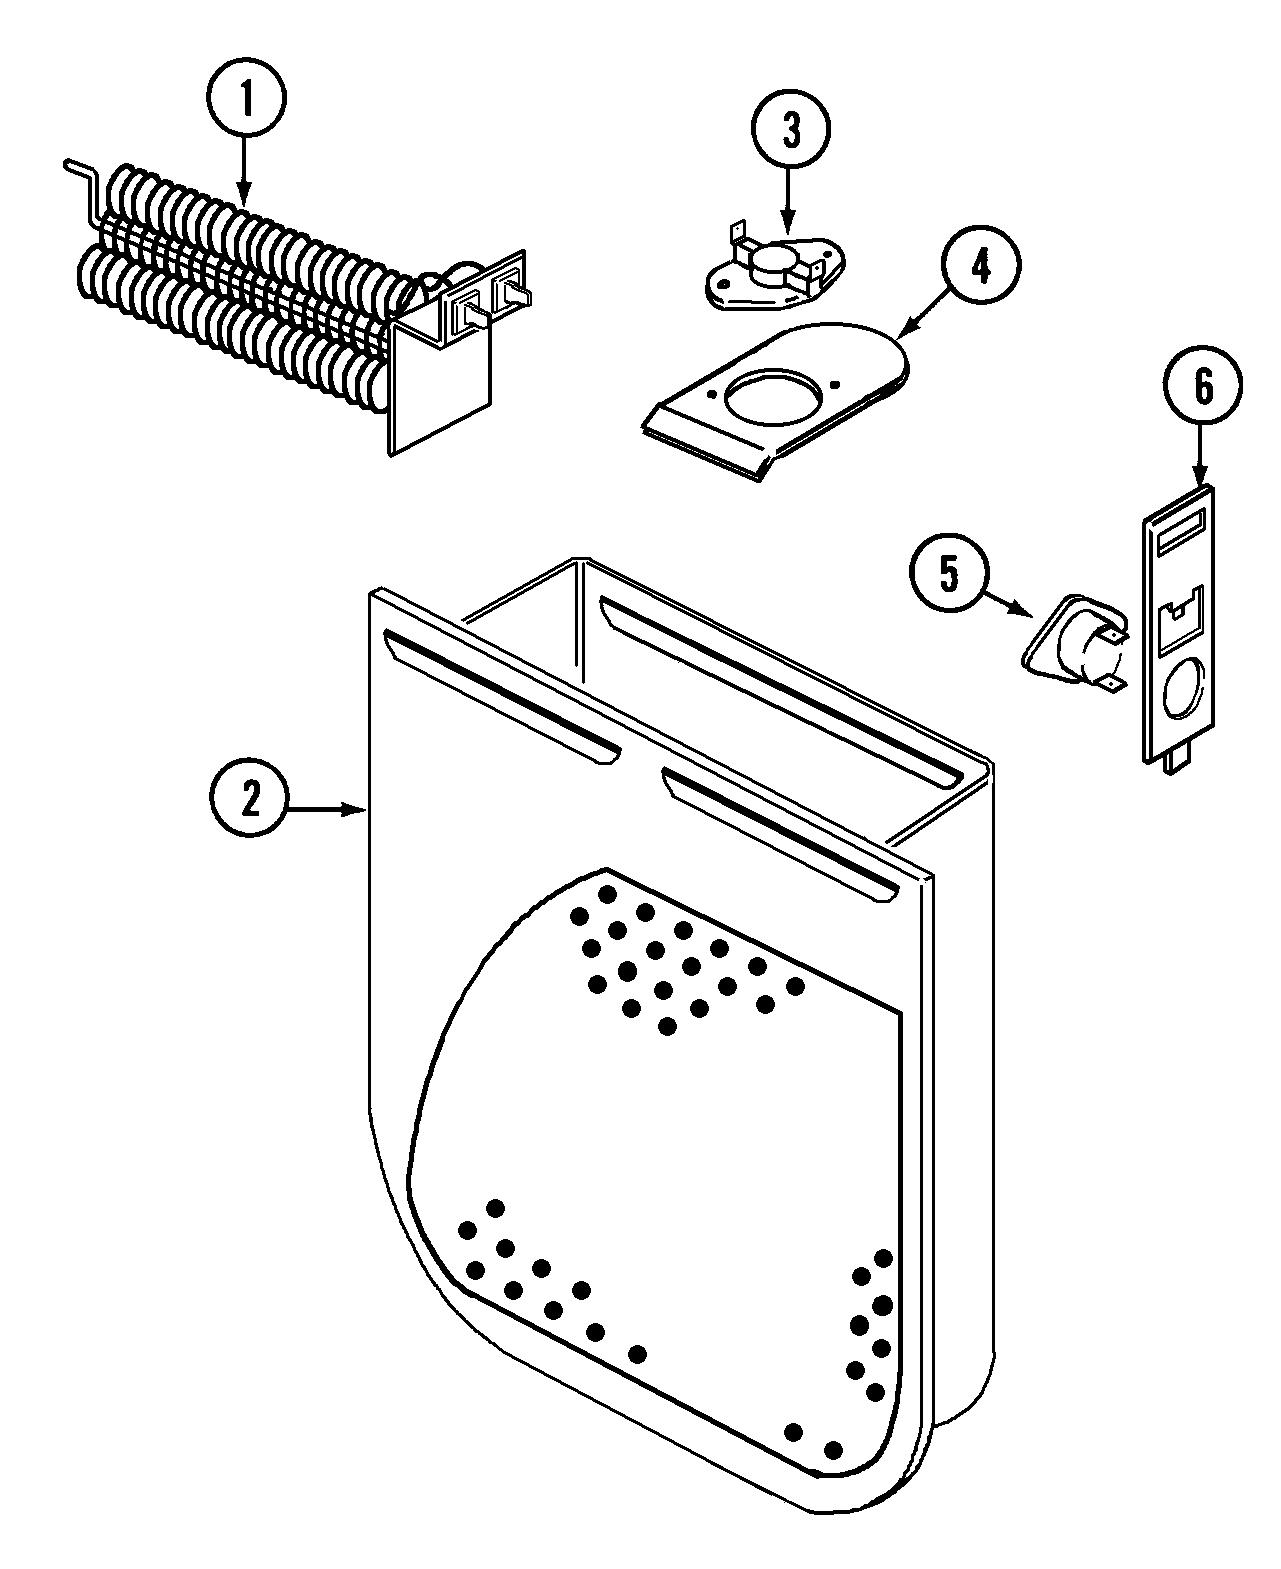 wiring diagram for maytag dg312 gas dryer appliance repair forum wiring diagram show [ 1281 x 1569 Pixel ]